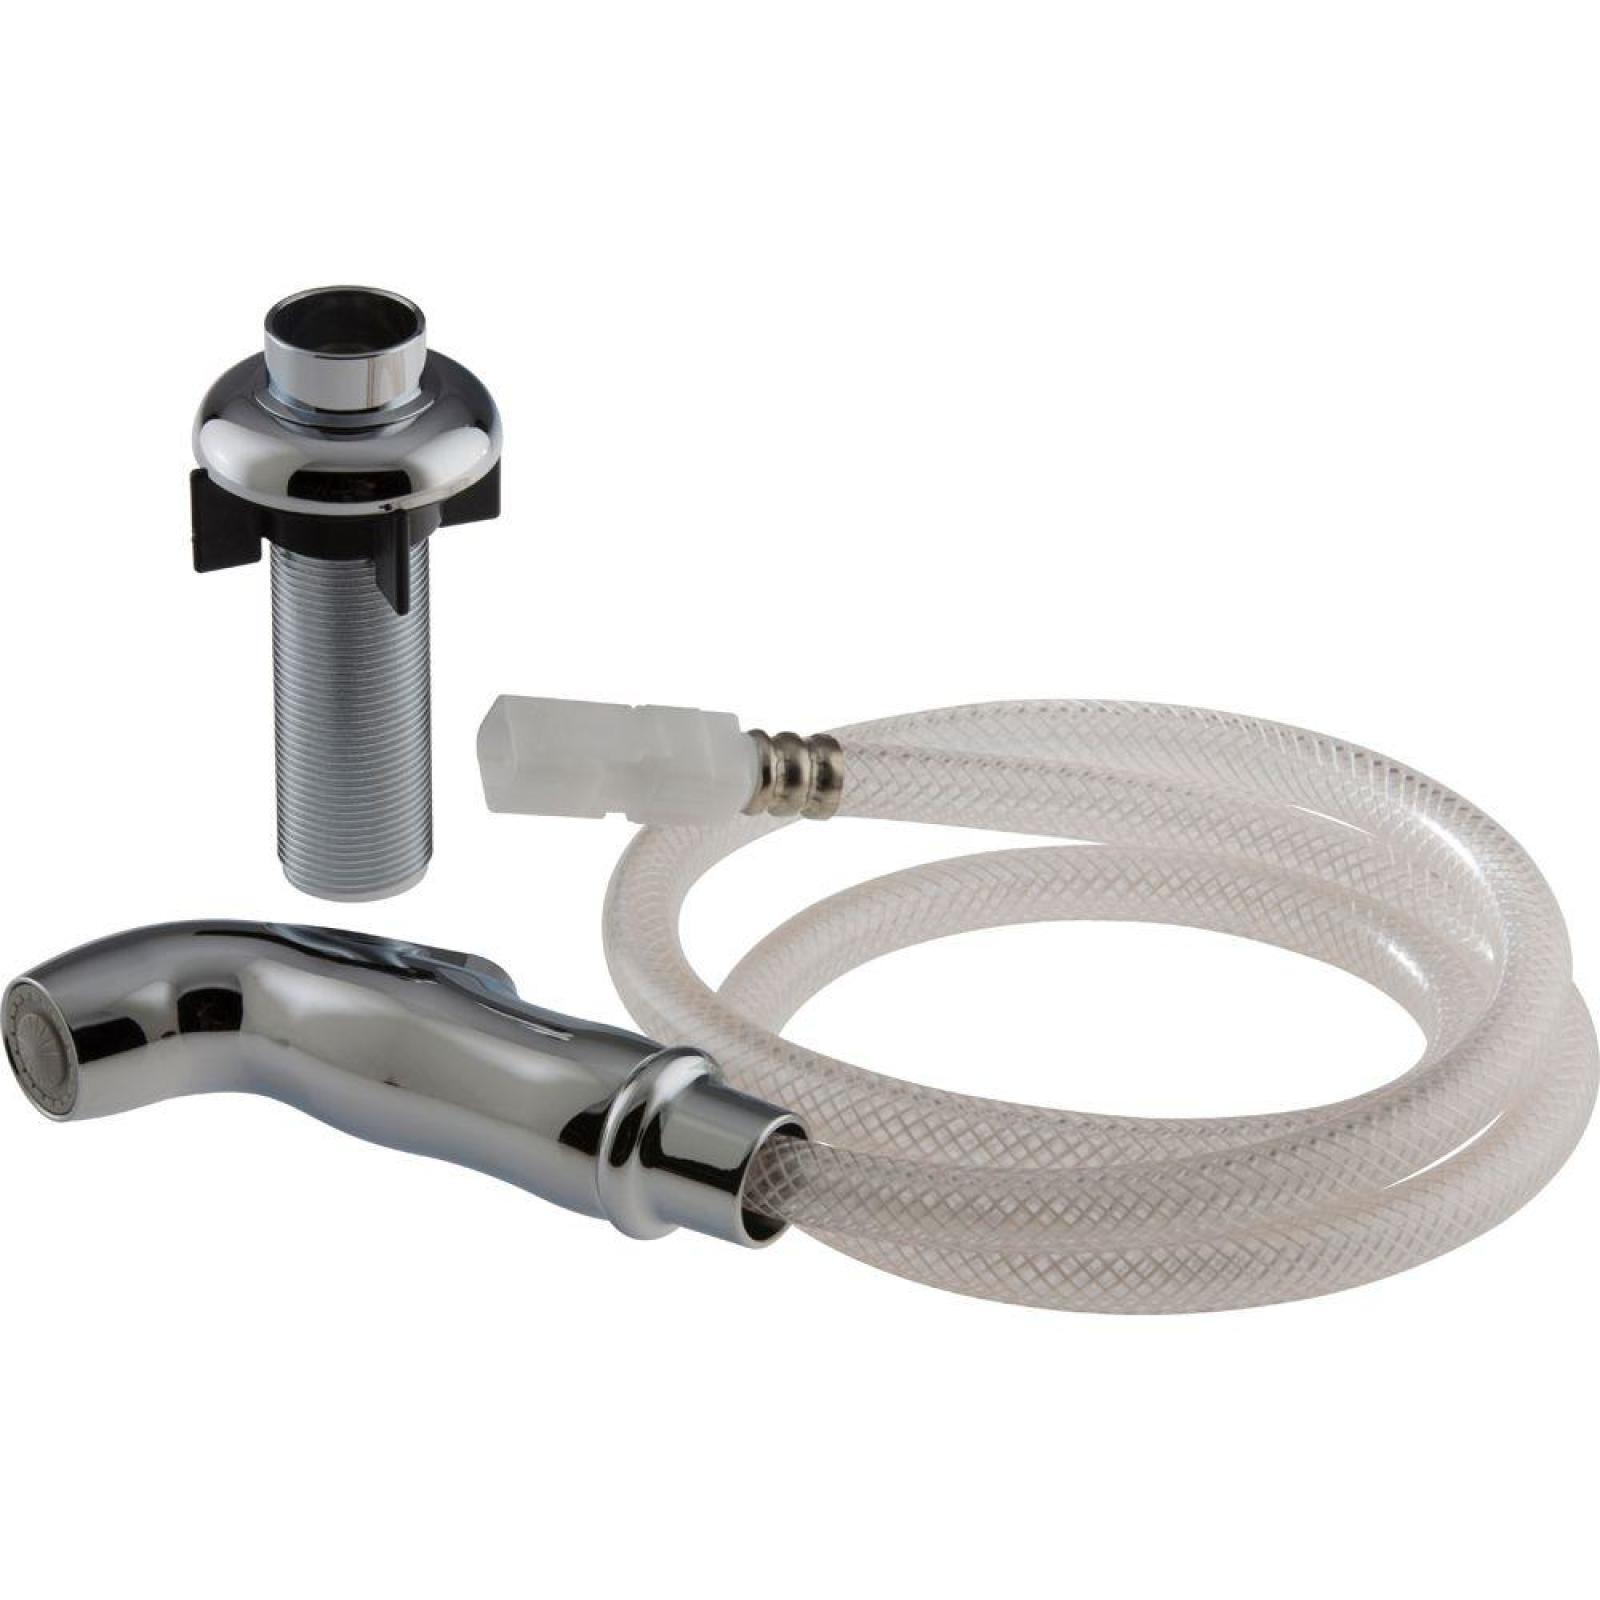 Kitchen Sink Sprayer Hose.Details About Delta Side Spray Assembly Chrome Kitchen Sink Head Faucet Sprayer Hose Durable